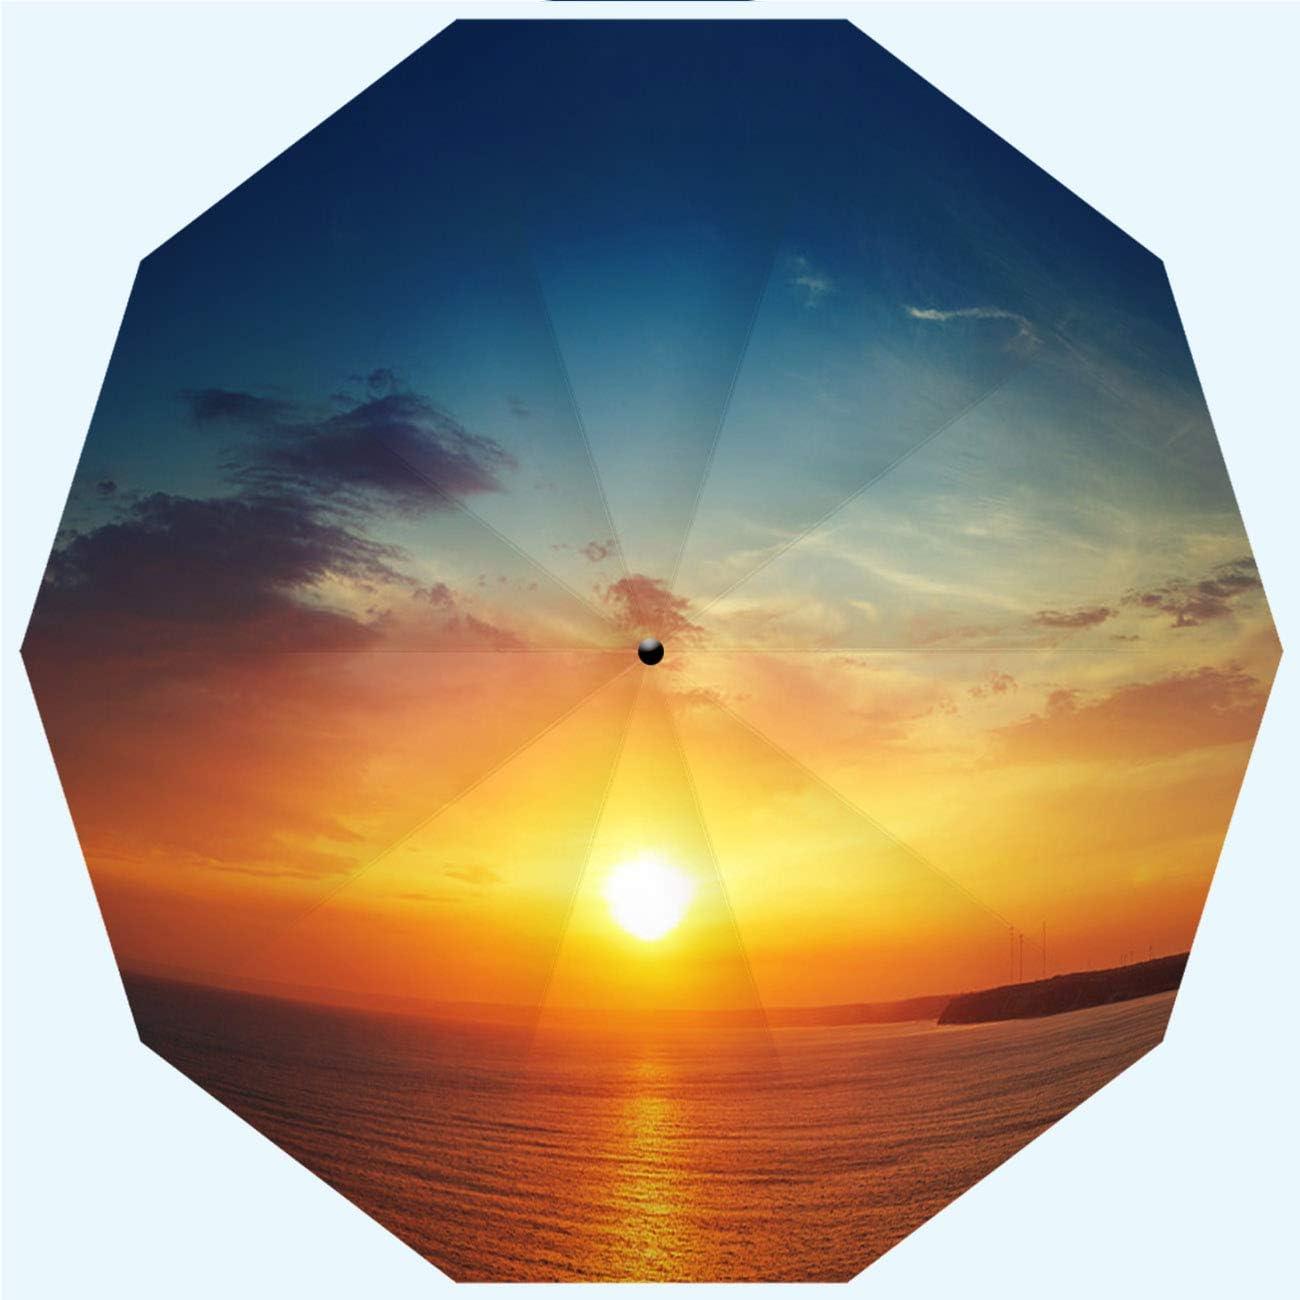 Men Automatic Opening and Closing,Big Sur Coastline,Windproof RLDSESS Outdoor Umbrella Ladies 10 Ribs Rainproof 42 Inches